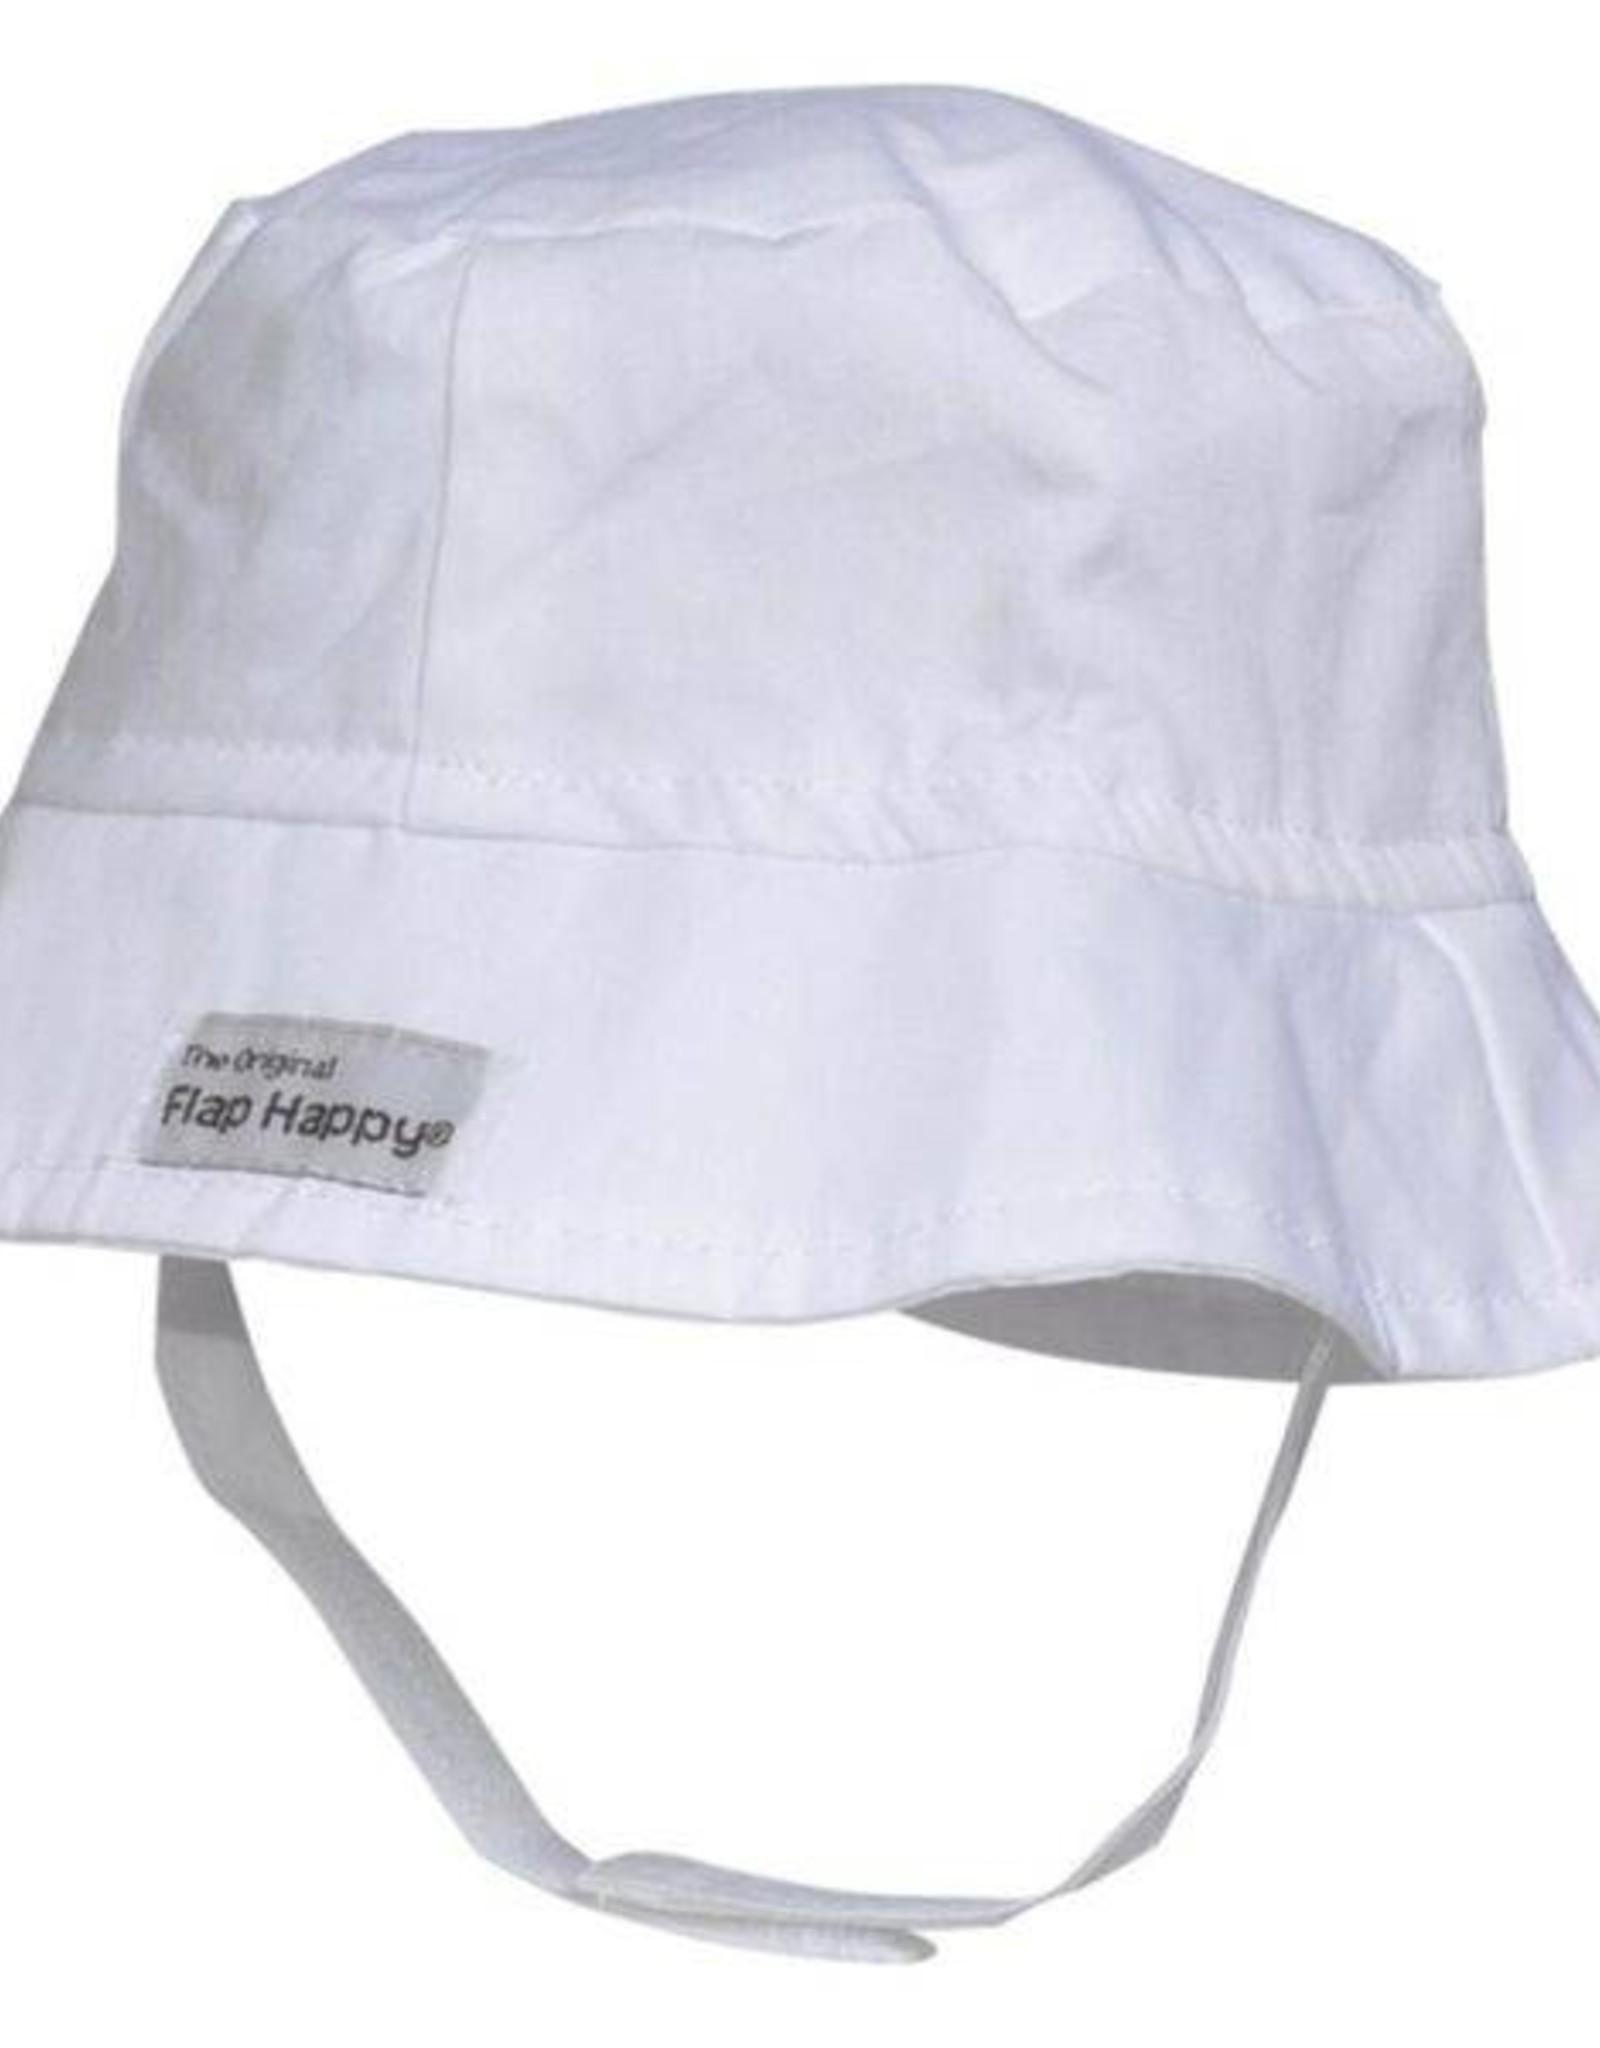 Flap Happy Bucket Hat White